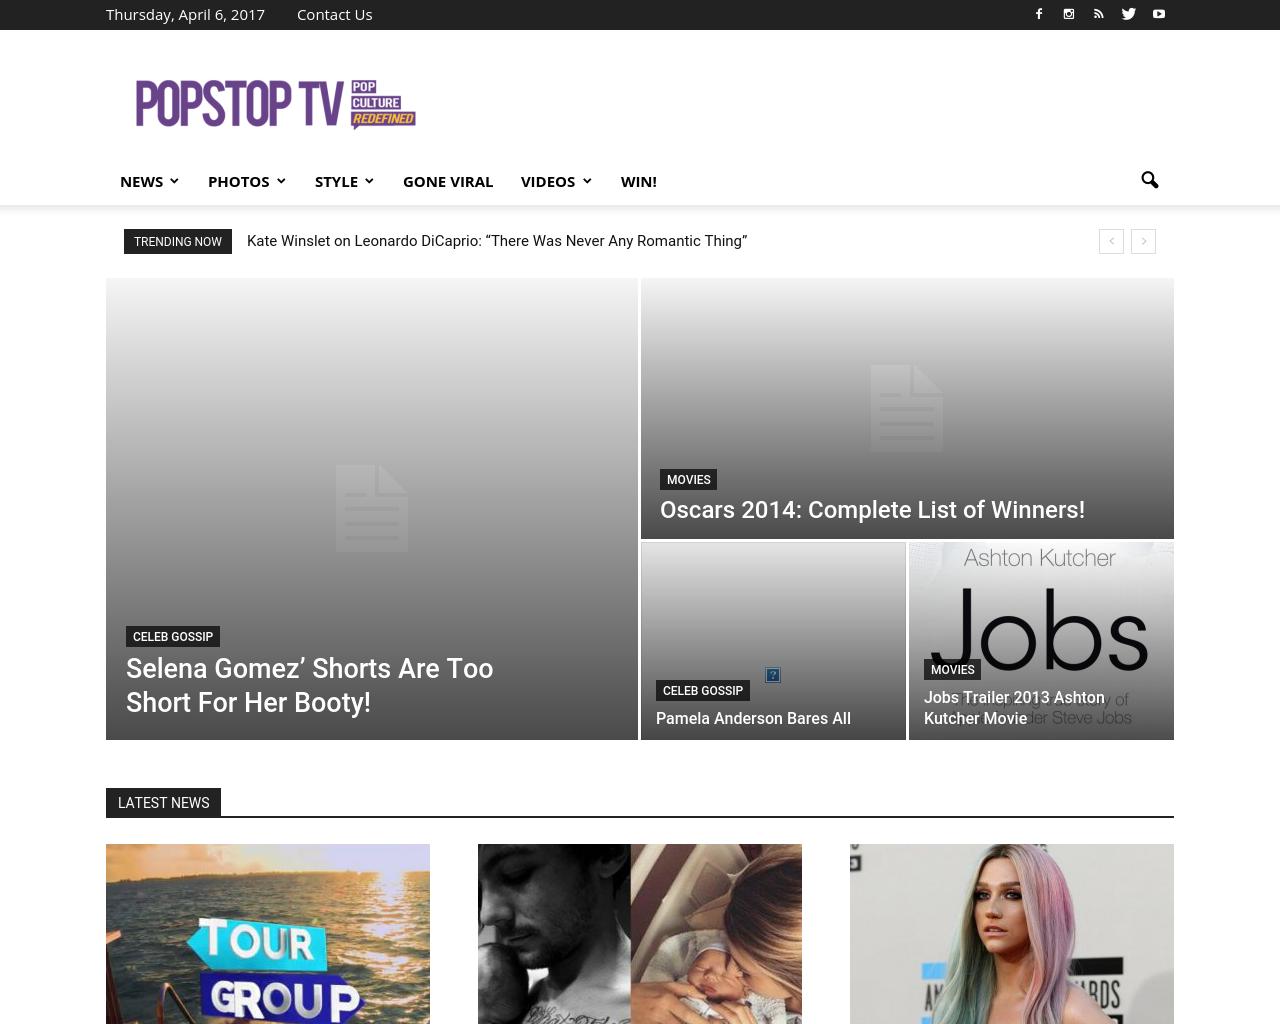 PopStopTV-Advertising-Reviews-Pricing